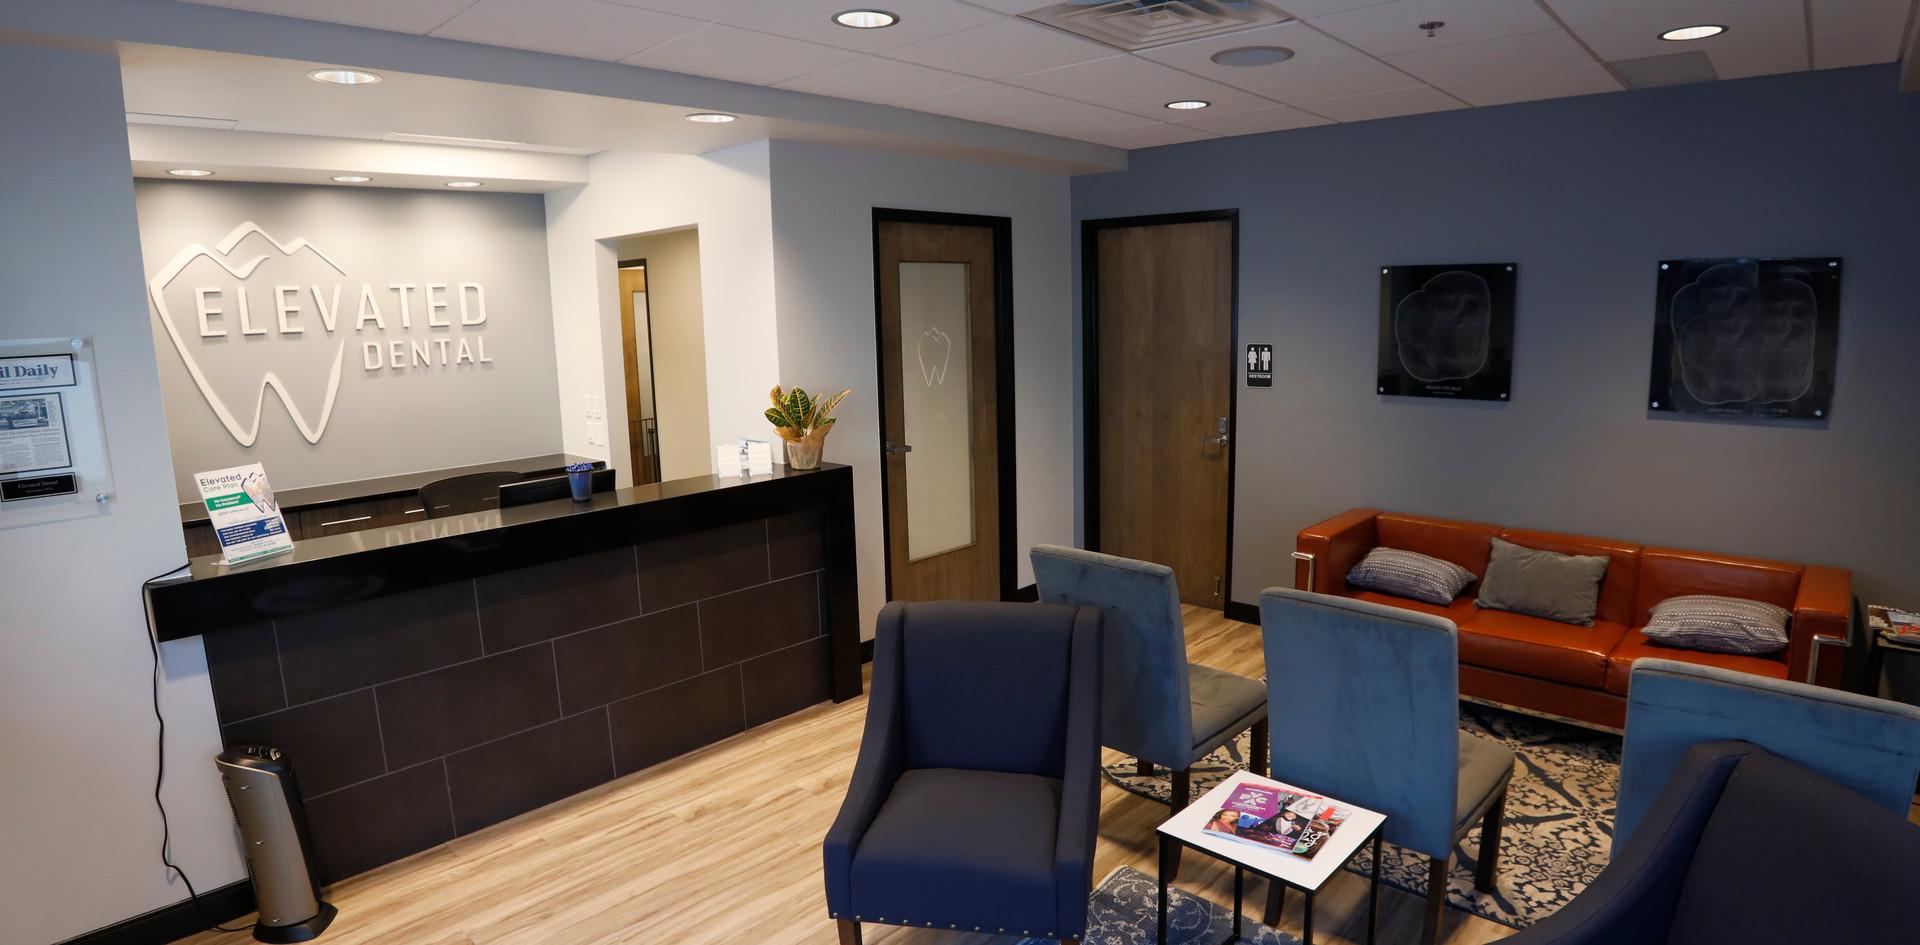 Elevated Dental Lobby 1.jpg